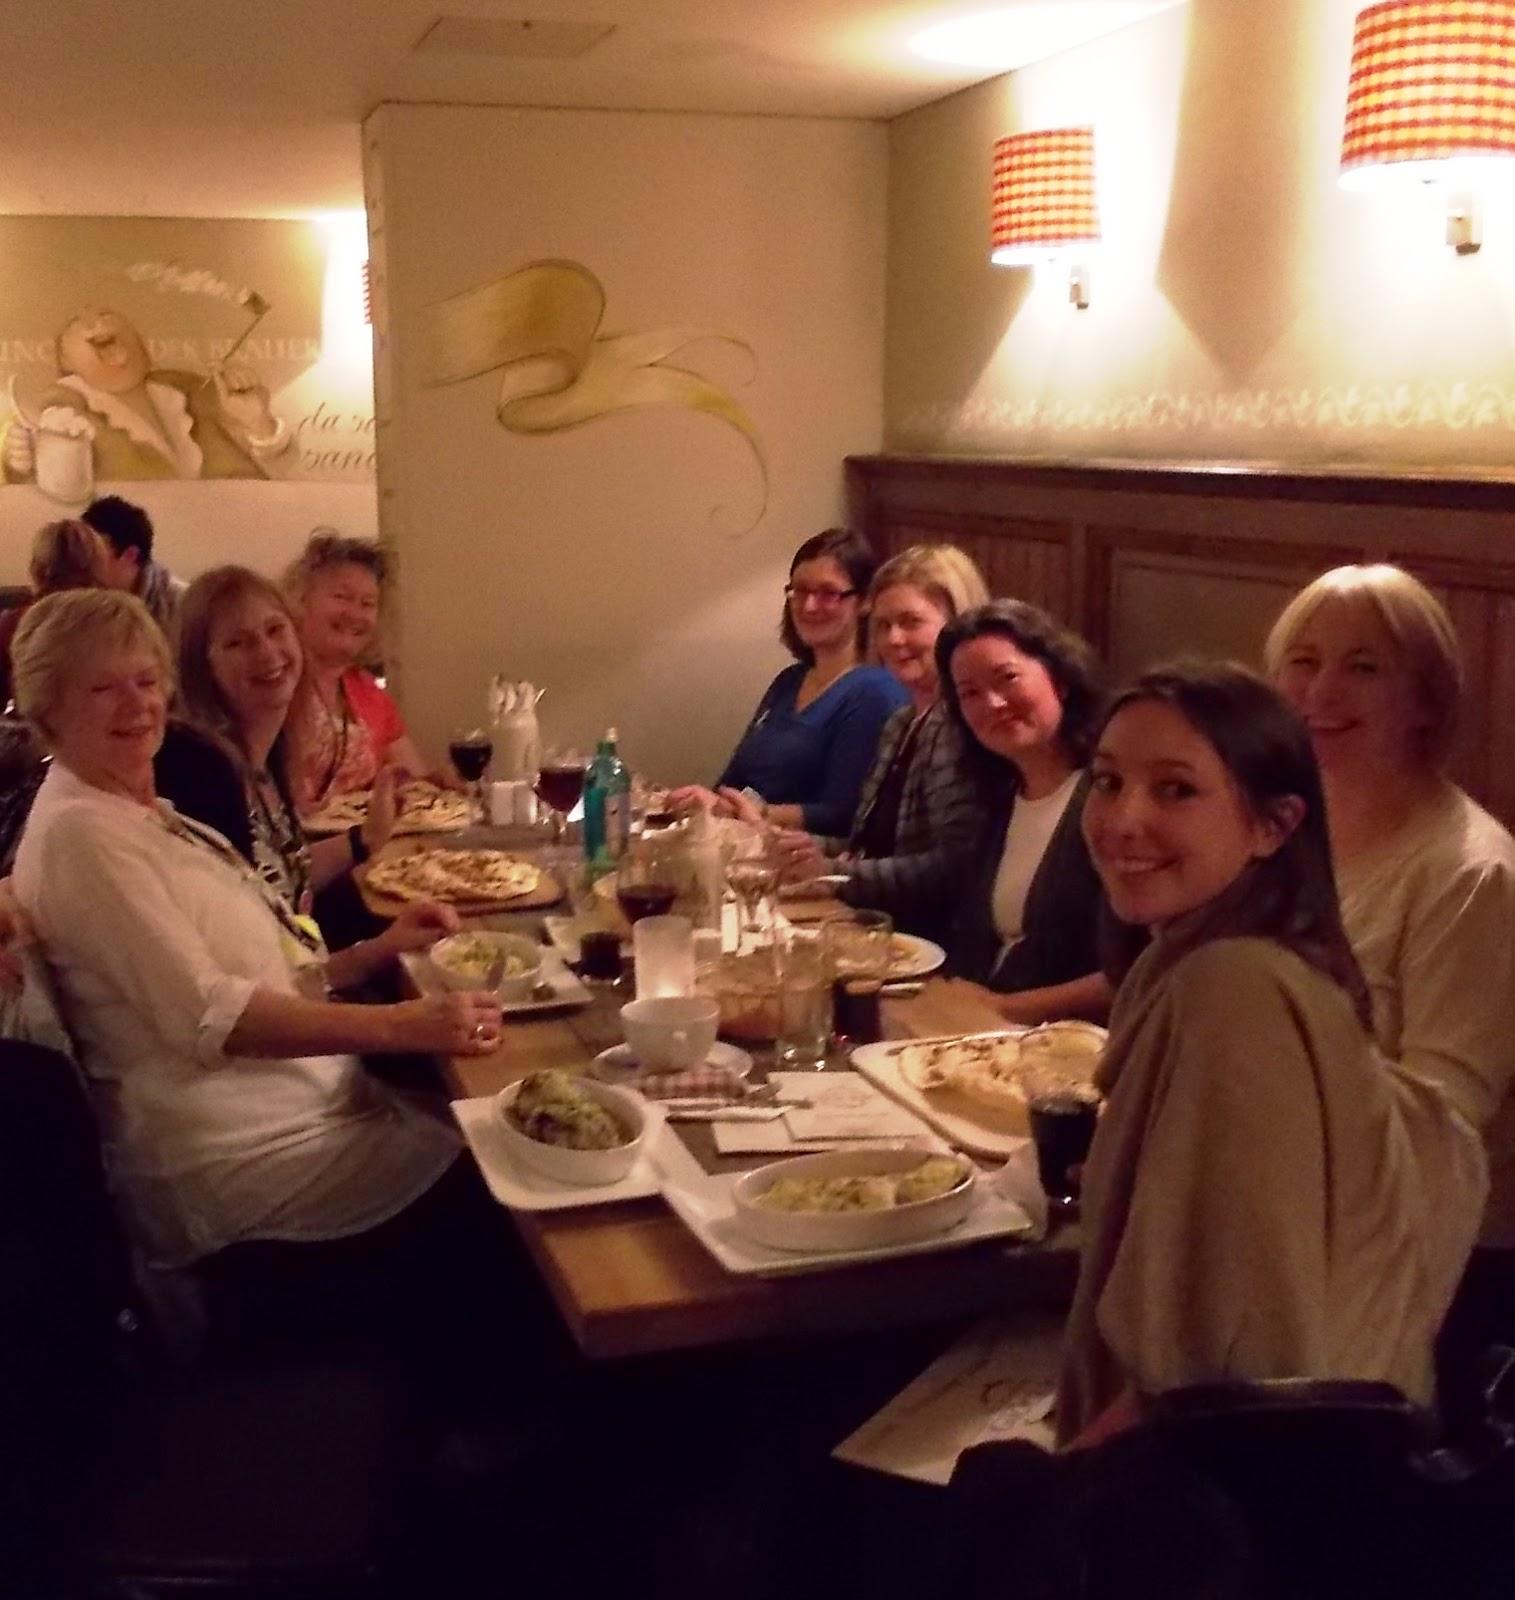 http://1.bp.blogspot.com/-ykJsV-gL-k8/UJfne-ROjnI/AAAAAAAADmc/fPUhr_FZIKE/s1600/dreamers+%2526+friends+at+dinner.JPG